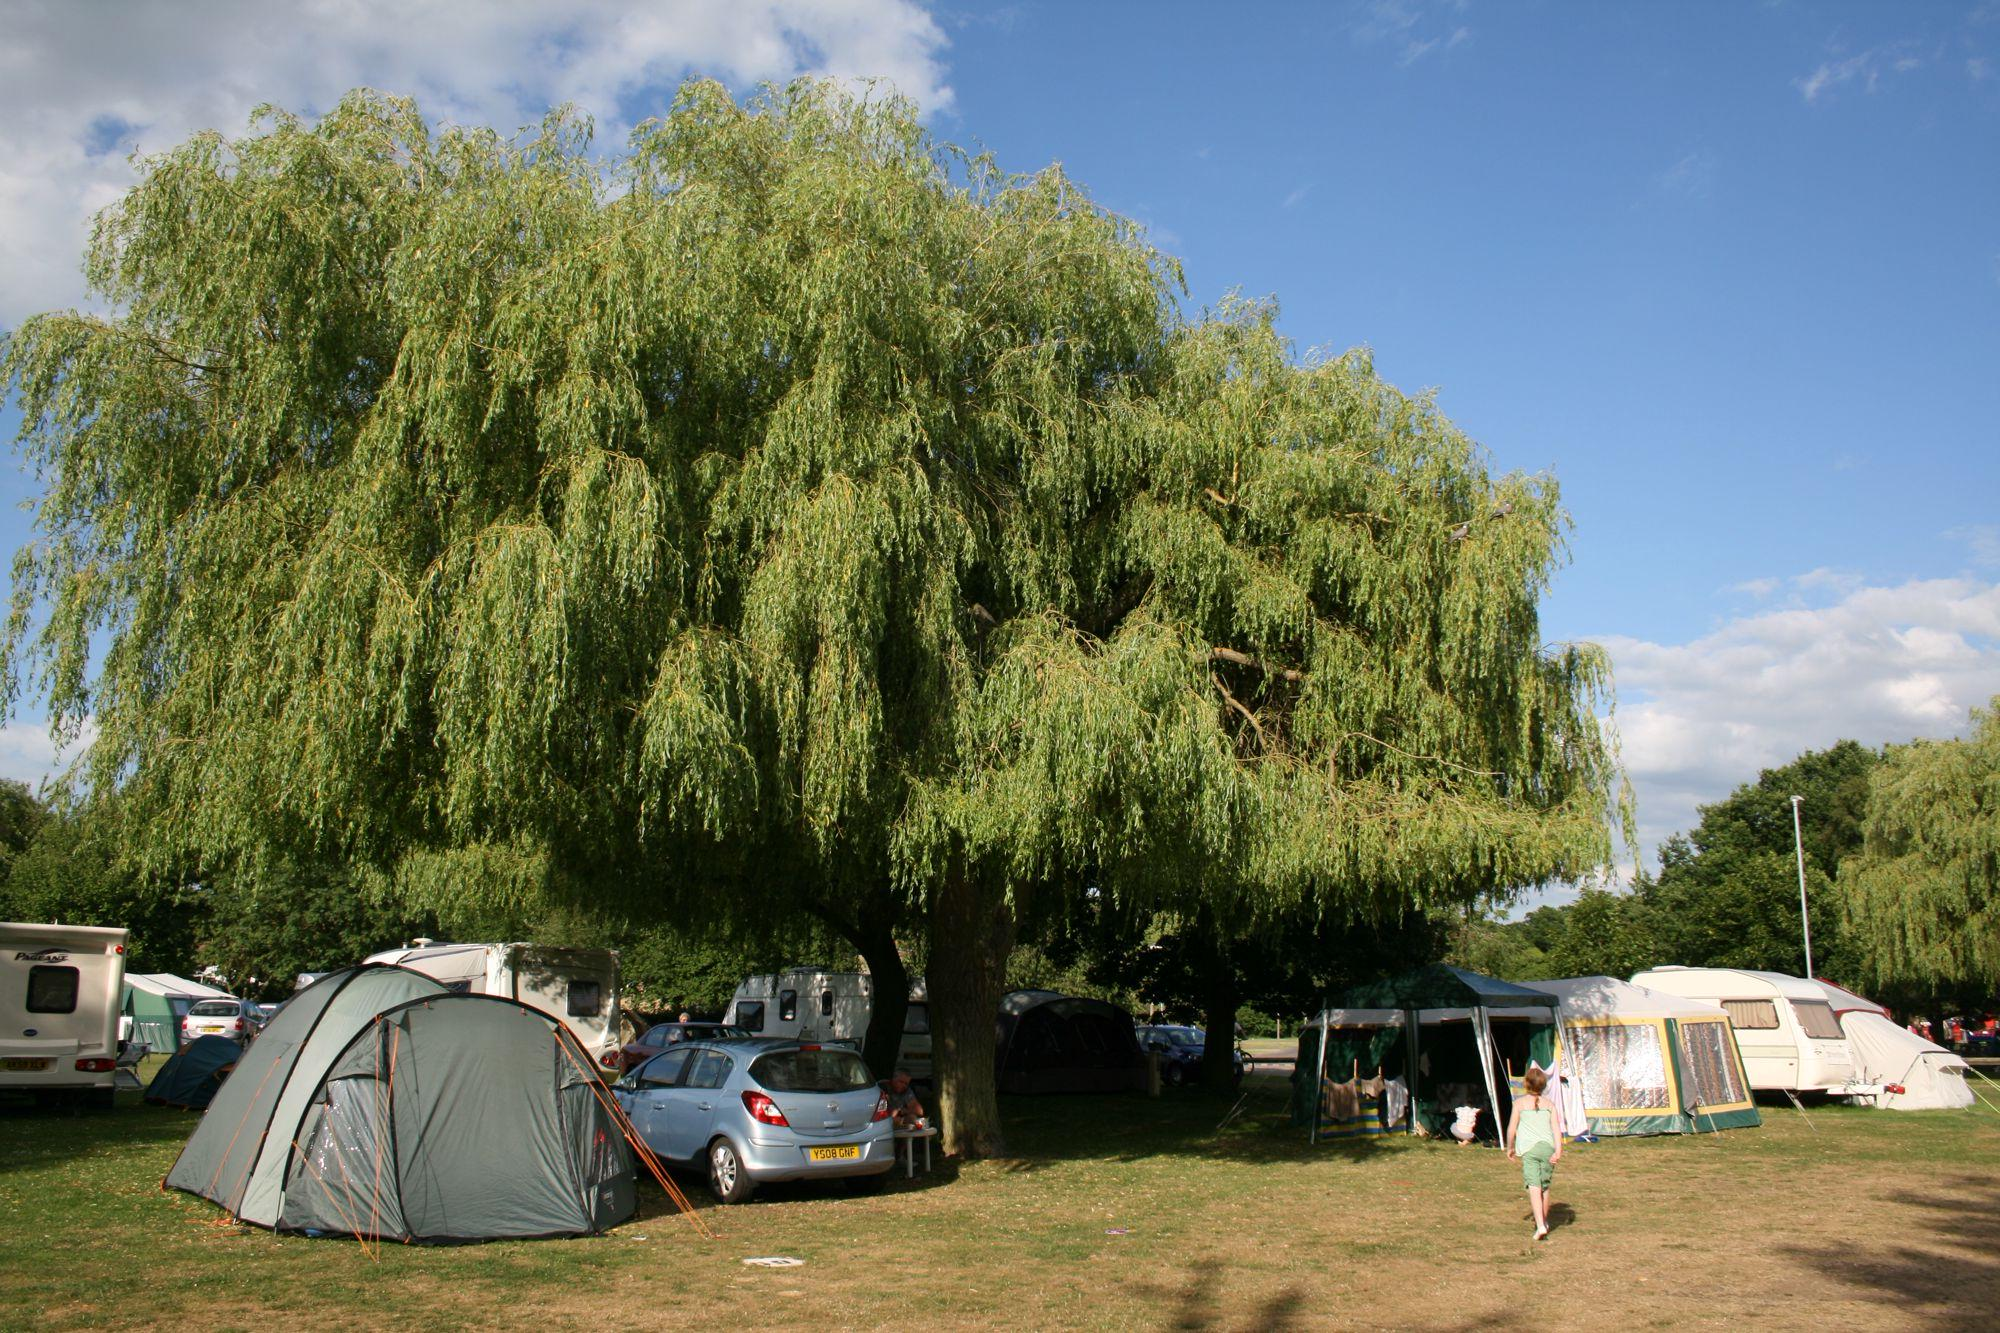 Jubilee Park, Lincolnshire